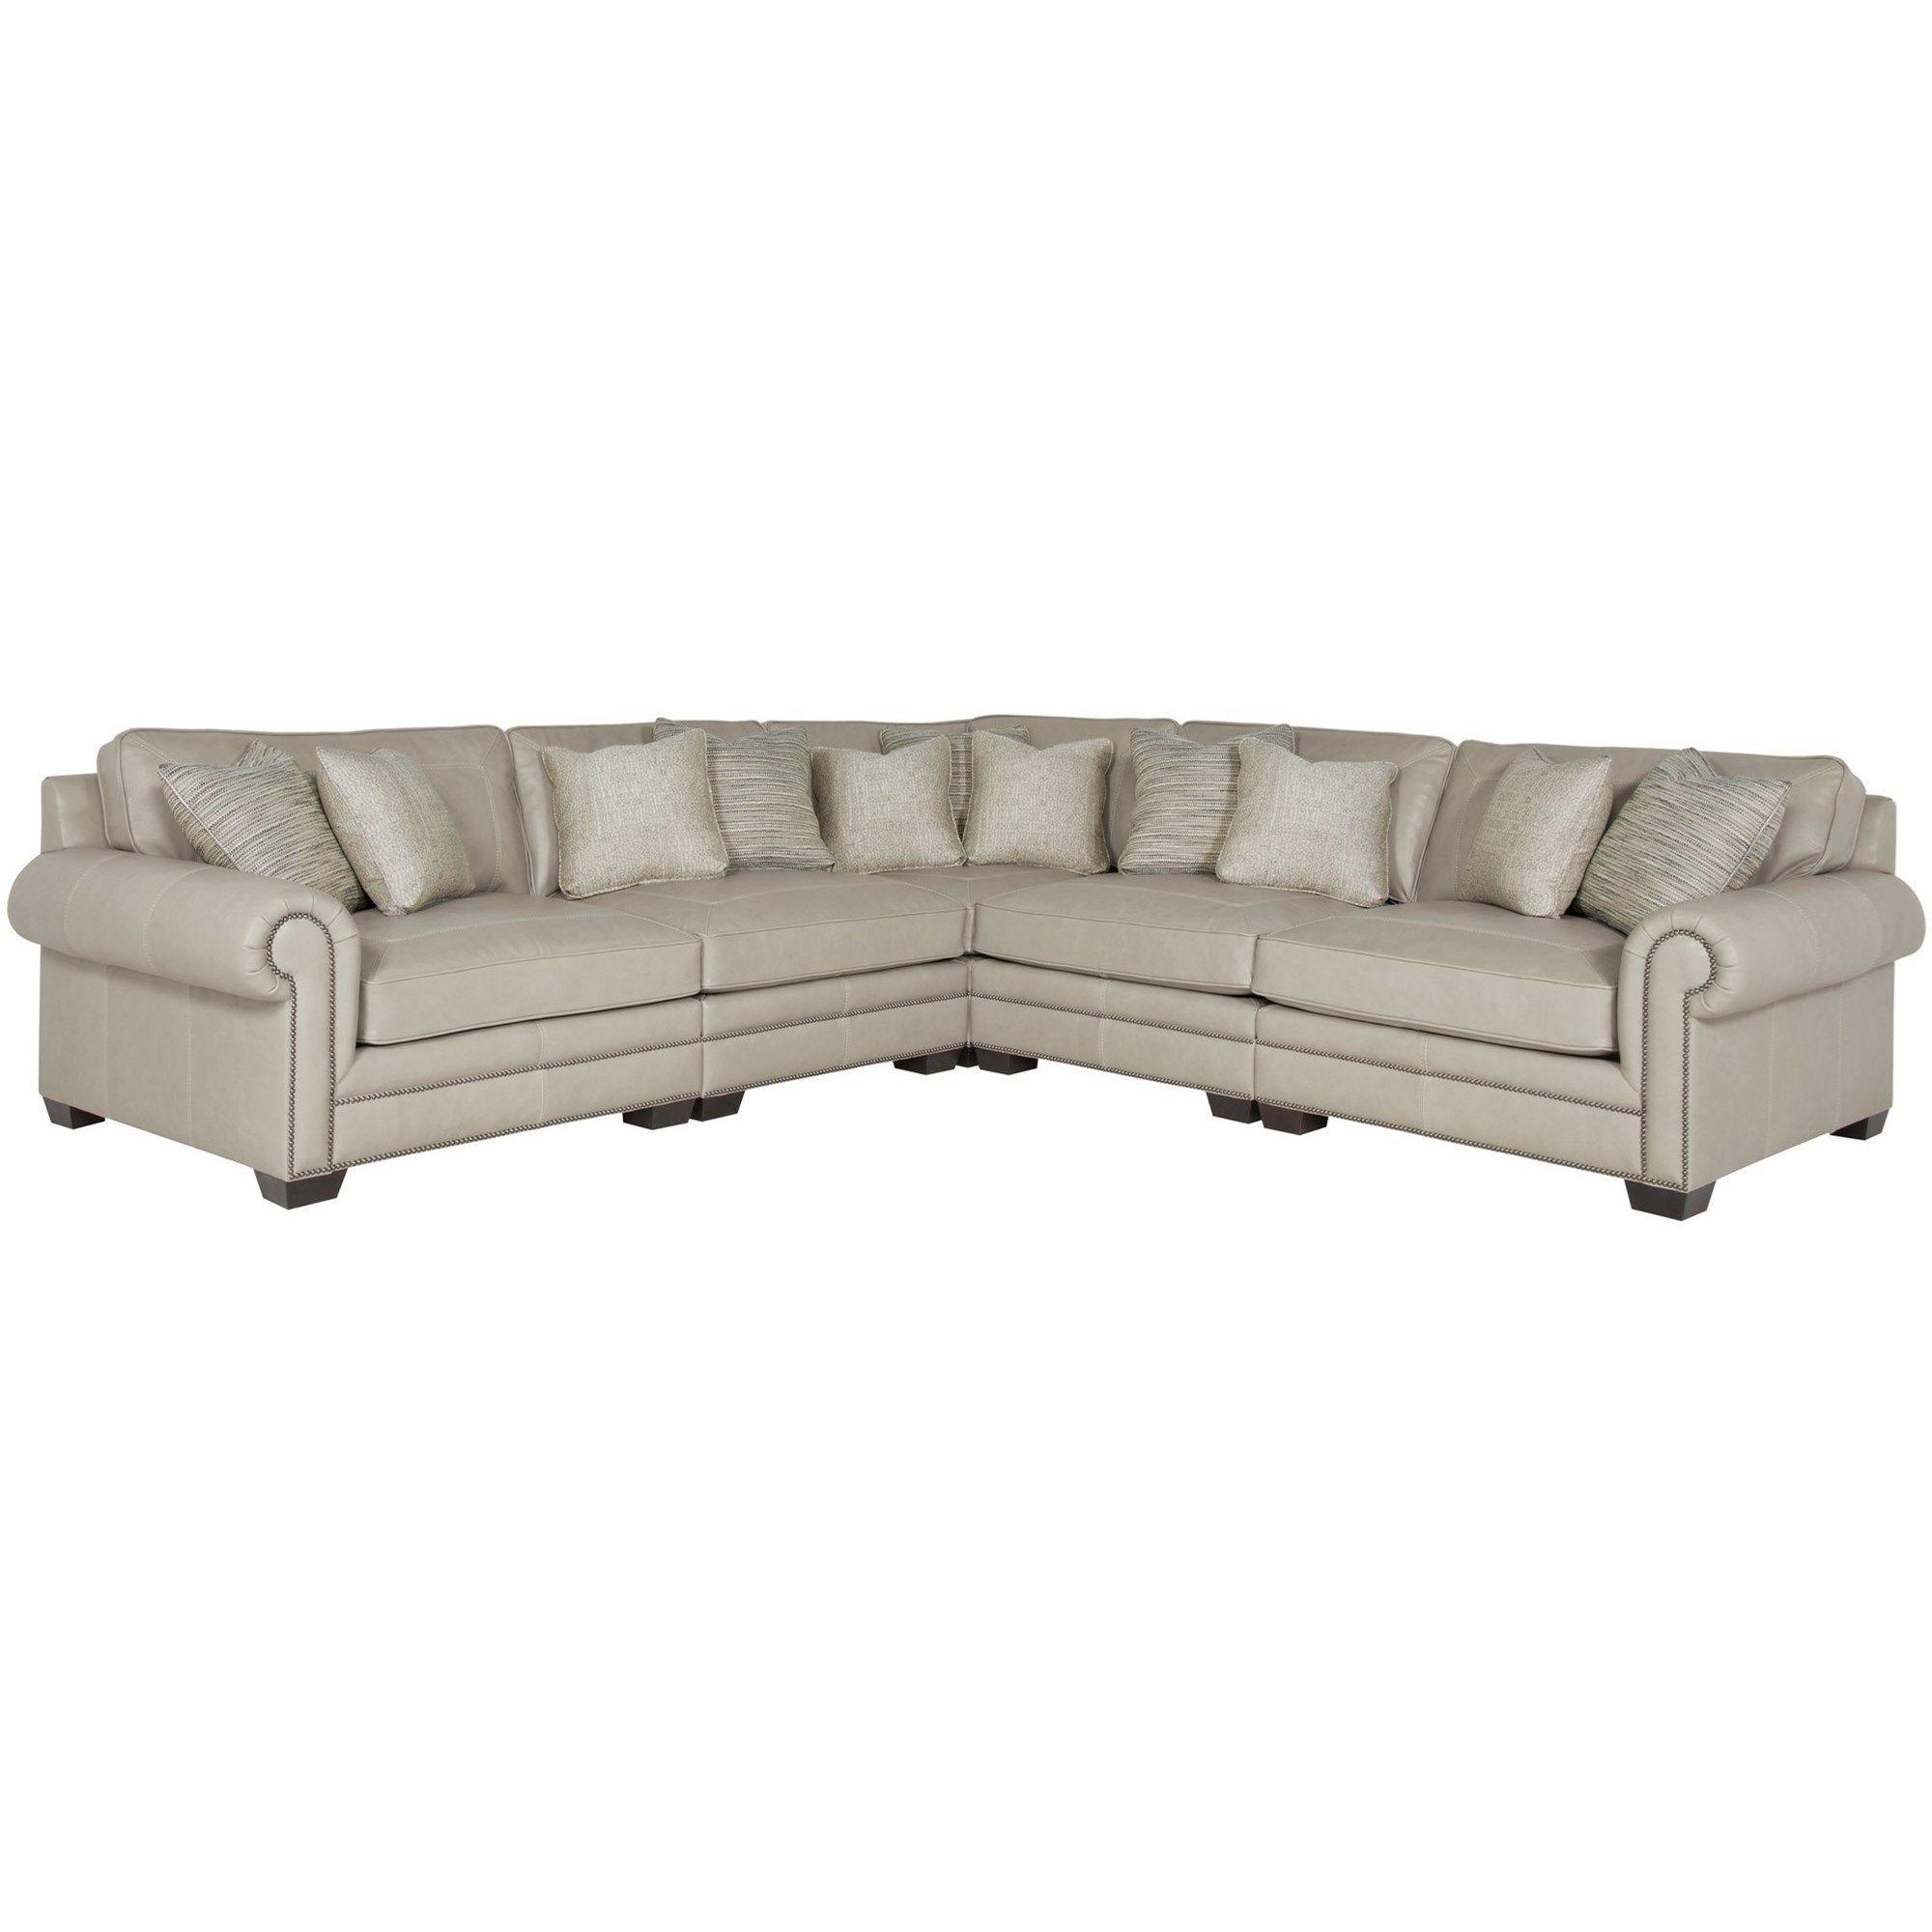 Bernhardt Interiors Grandview 7230l 7232l 7235l 7236l Transitional Sectional Sofa With Nailhead Trim Baer Modular Sectional Leather Sectional Sectional